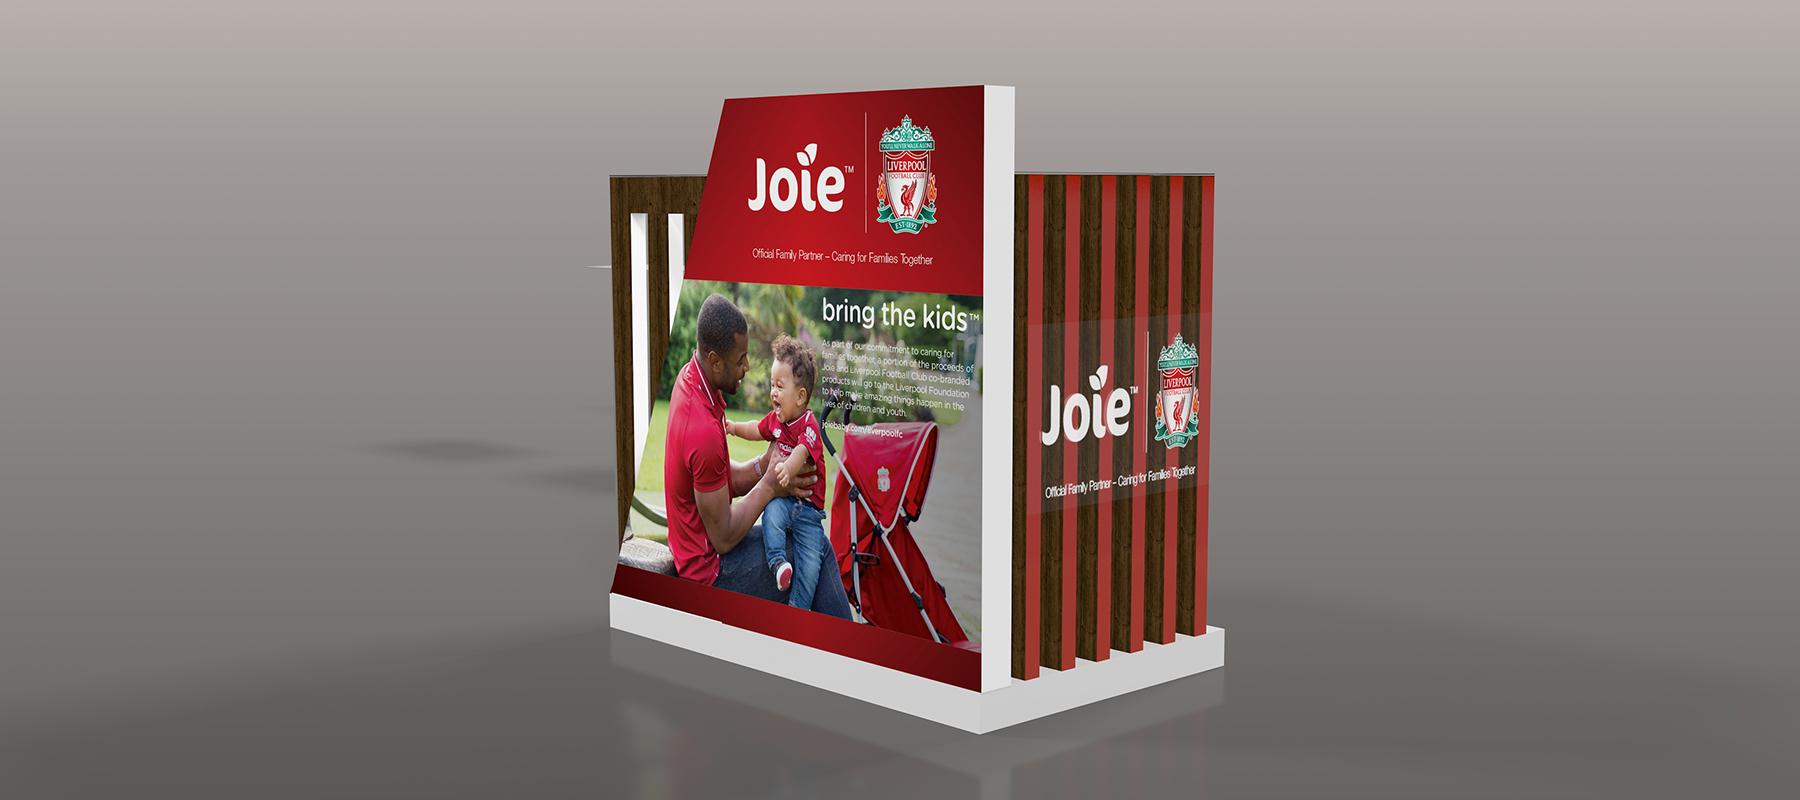 Joie Liverpool 3